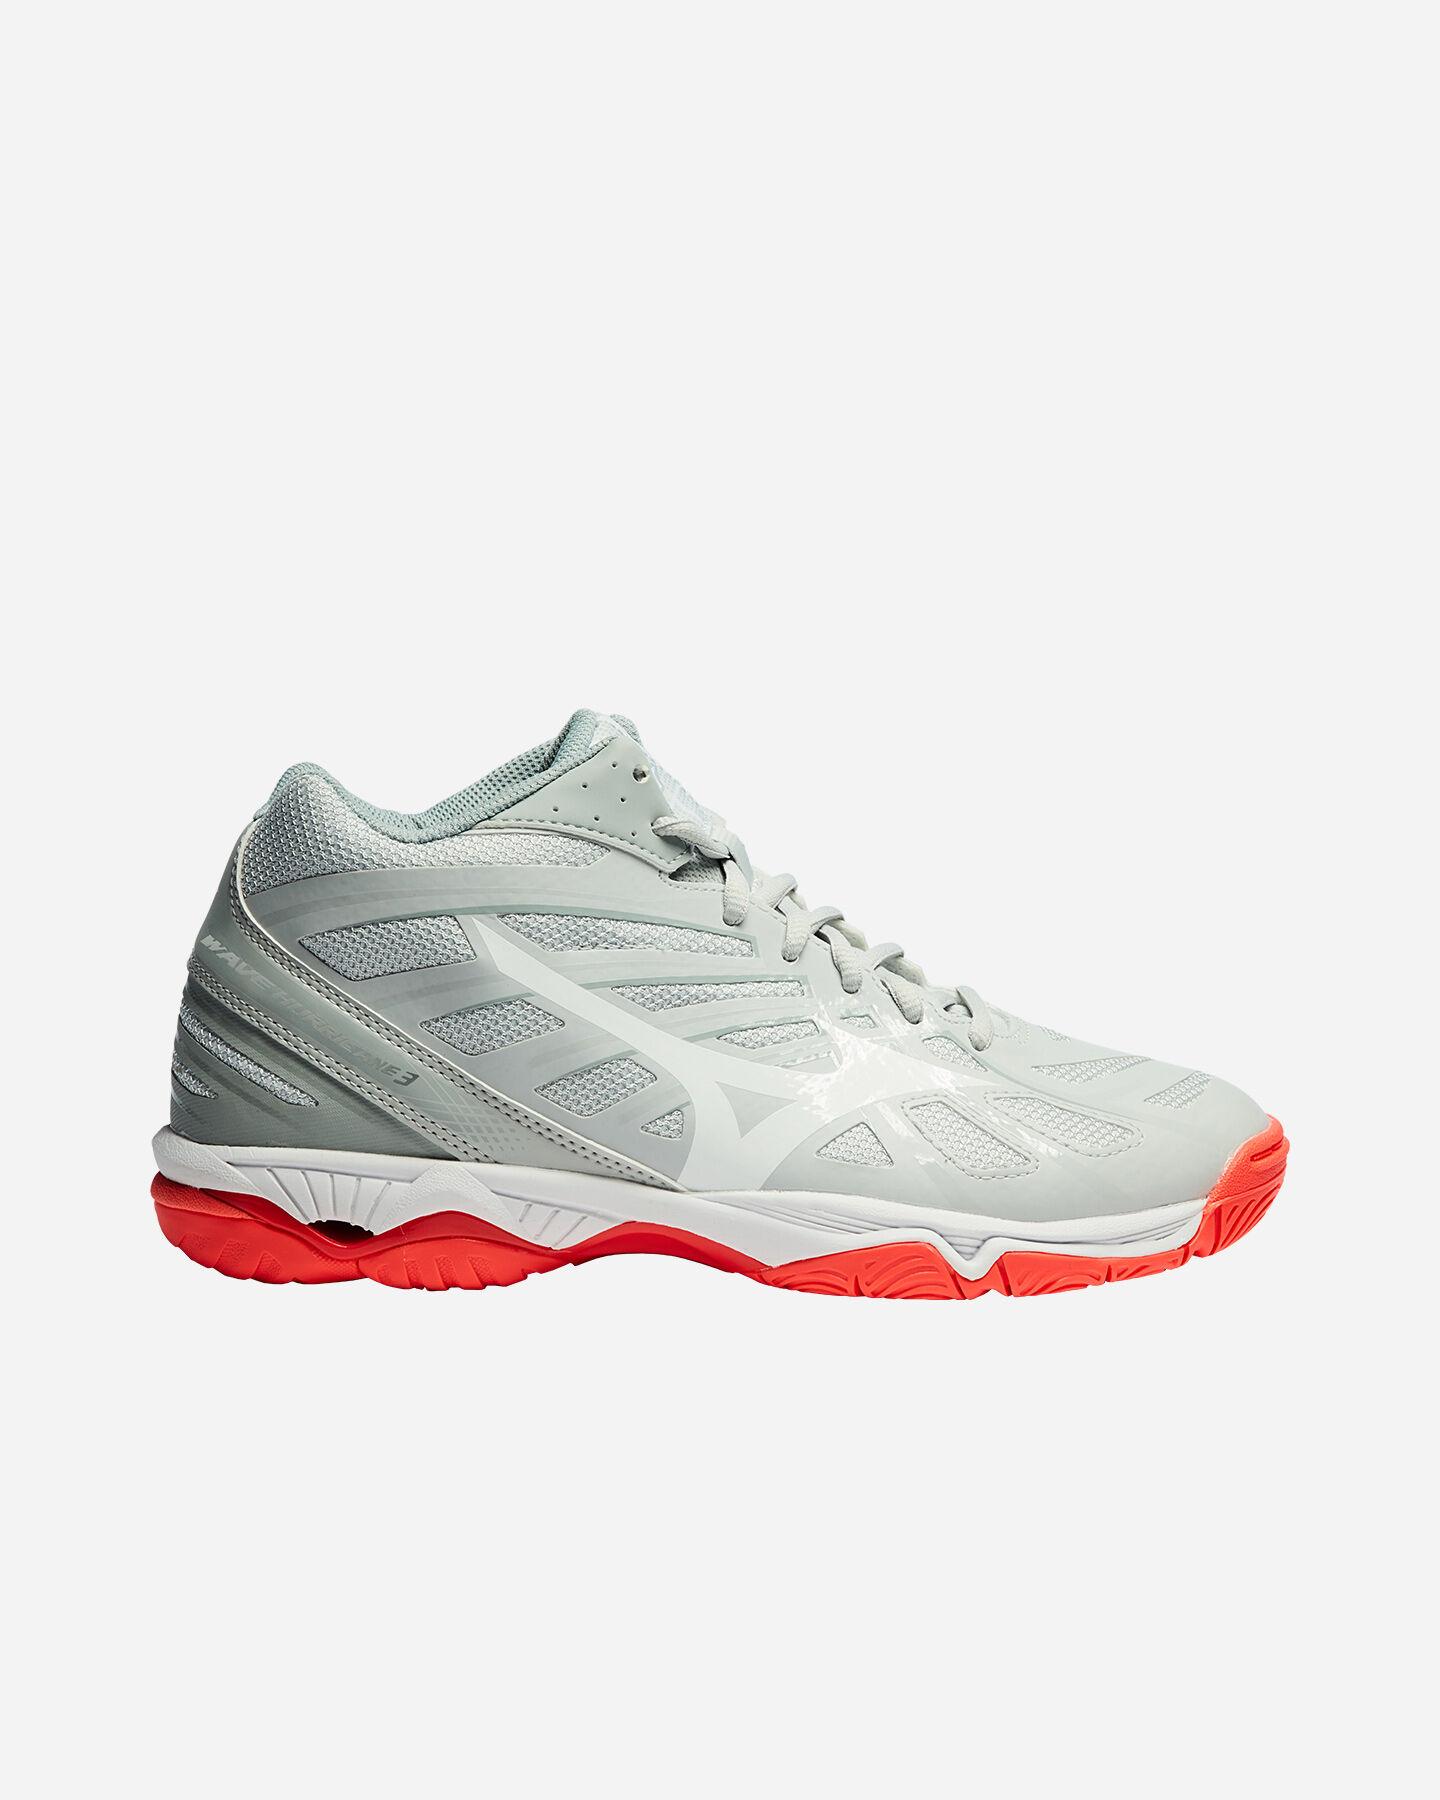 online store b9284 1bb86 Scarpe Scarpe DonnaSneakersInfraditoScarponiCiaspole Scarpe ...